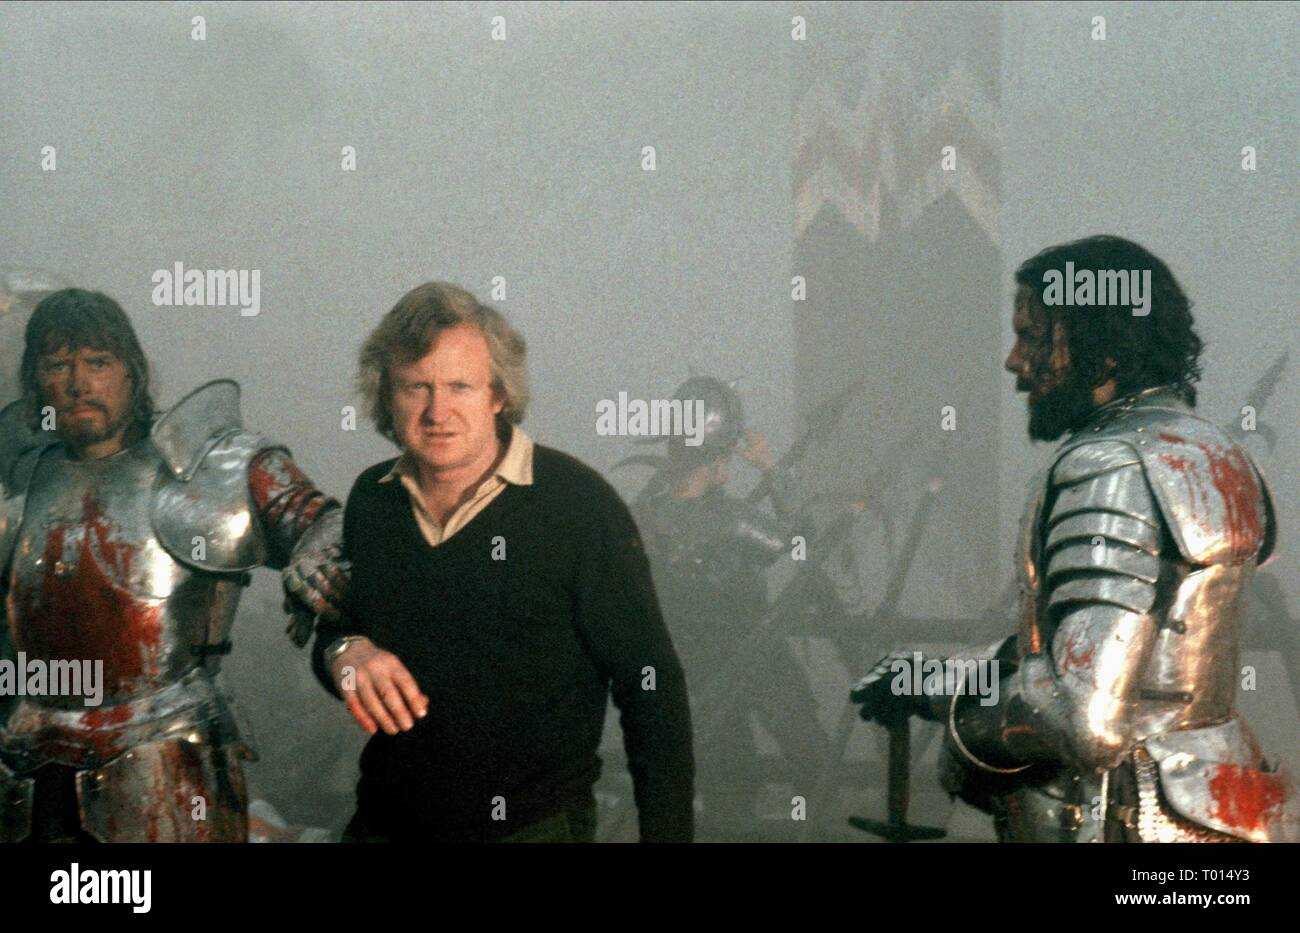 NIGEL TERRY, JOHN BOORMAN, PAUL GEOFFREY, EXCALIBUR, 1981 - Stock Image